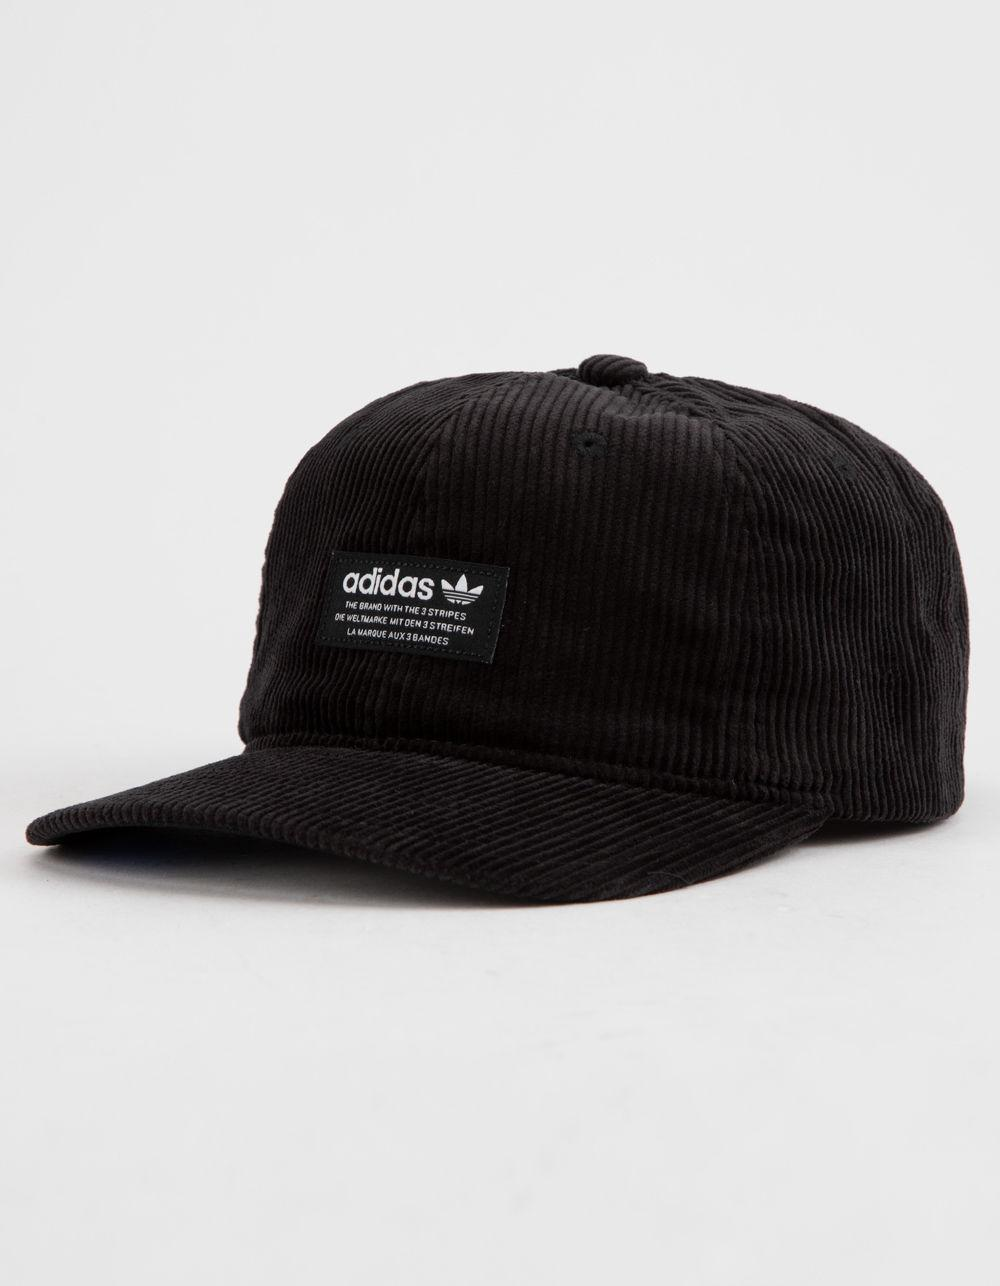 6b2bdb733af Adidas - Originals Relaxed Wide Wale Corduroy Black Mens Strapback Hat for  Men - Lyst. View fullscreen